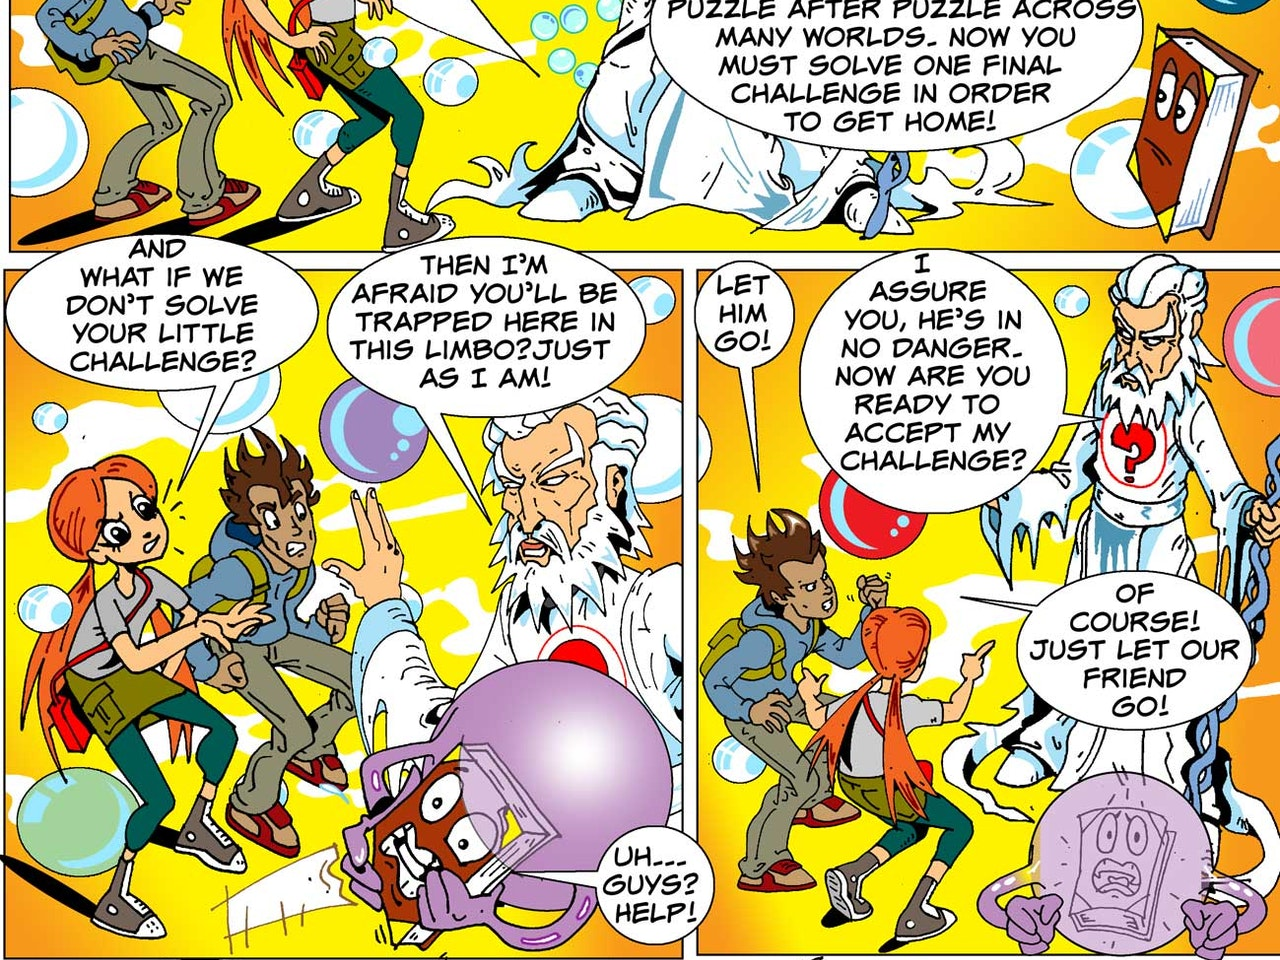 wizard mathematics educational learning illustration animation  funny humorous comical colourful graphic cartoon manga anime publishing